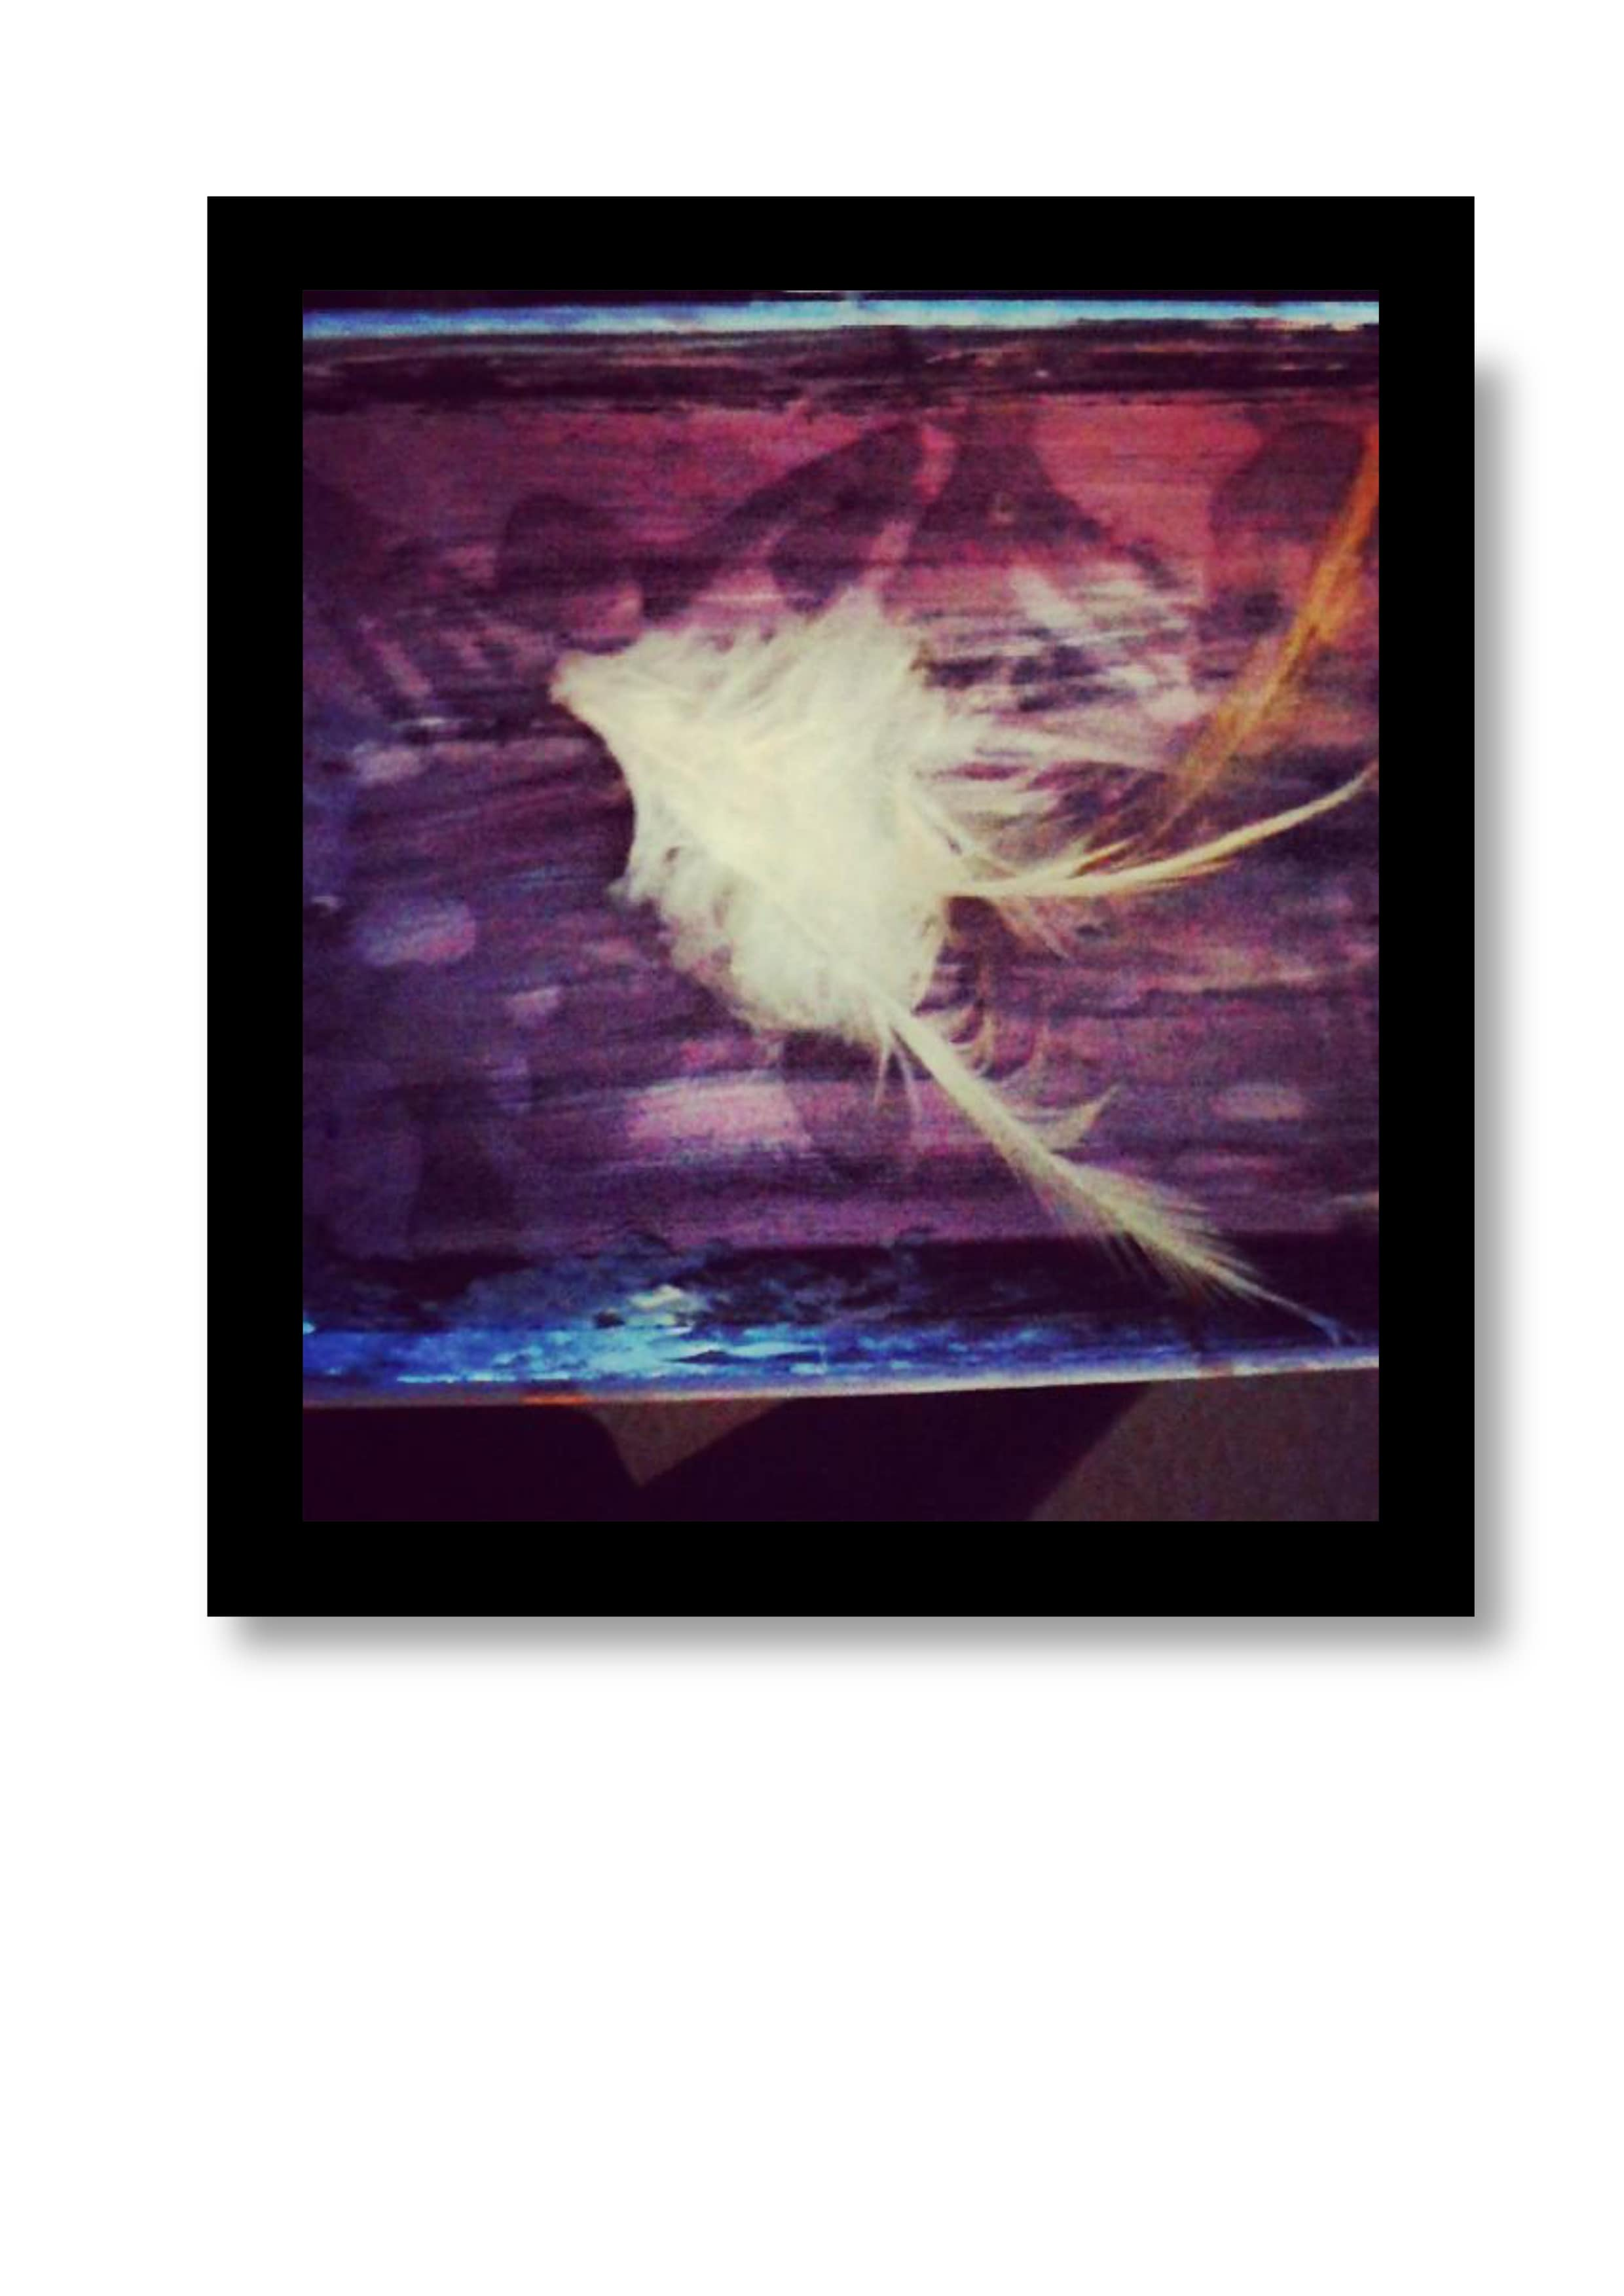 art-portfolio-aglae-corrected-8-min.jpg